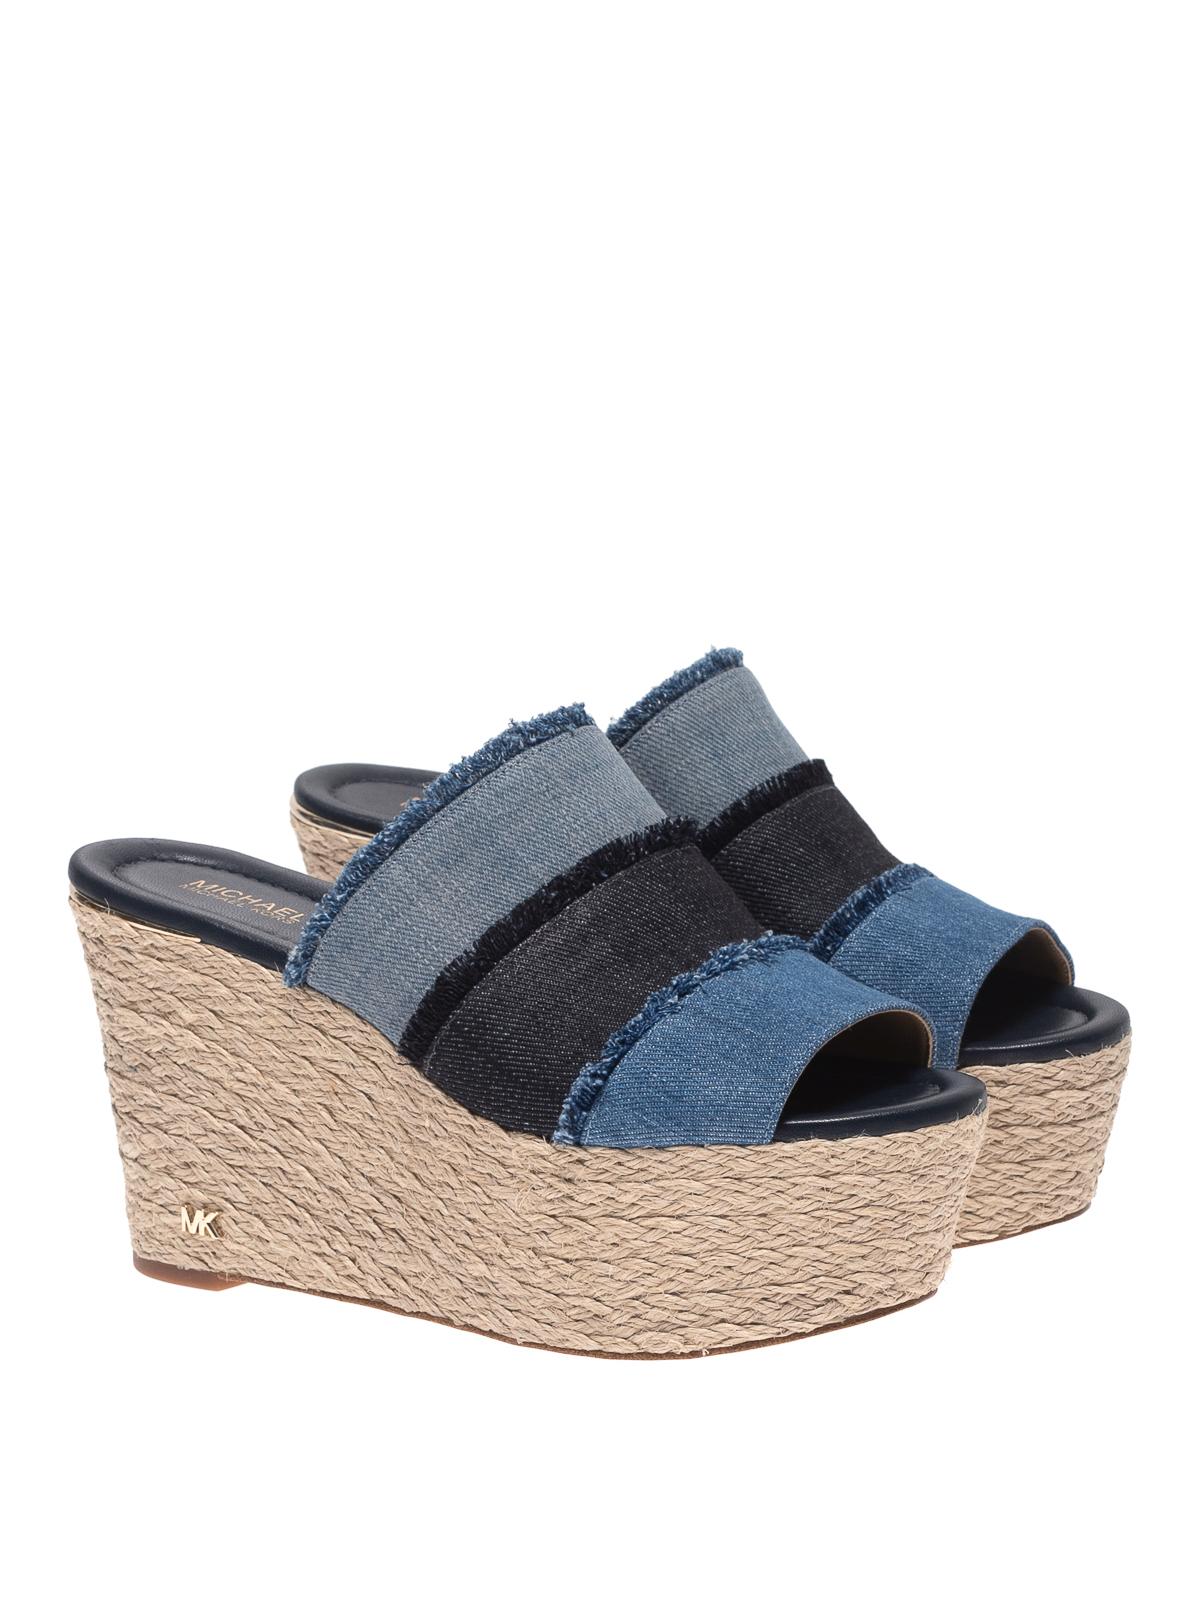 Michael Kors - Denim wedge sandals